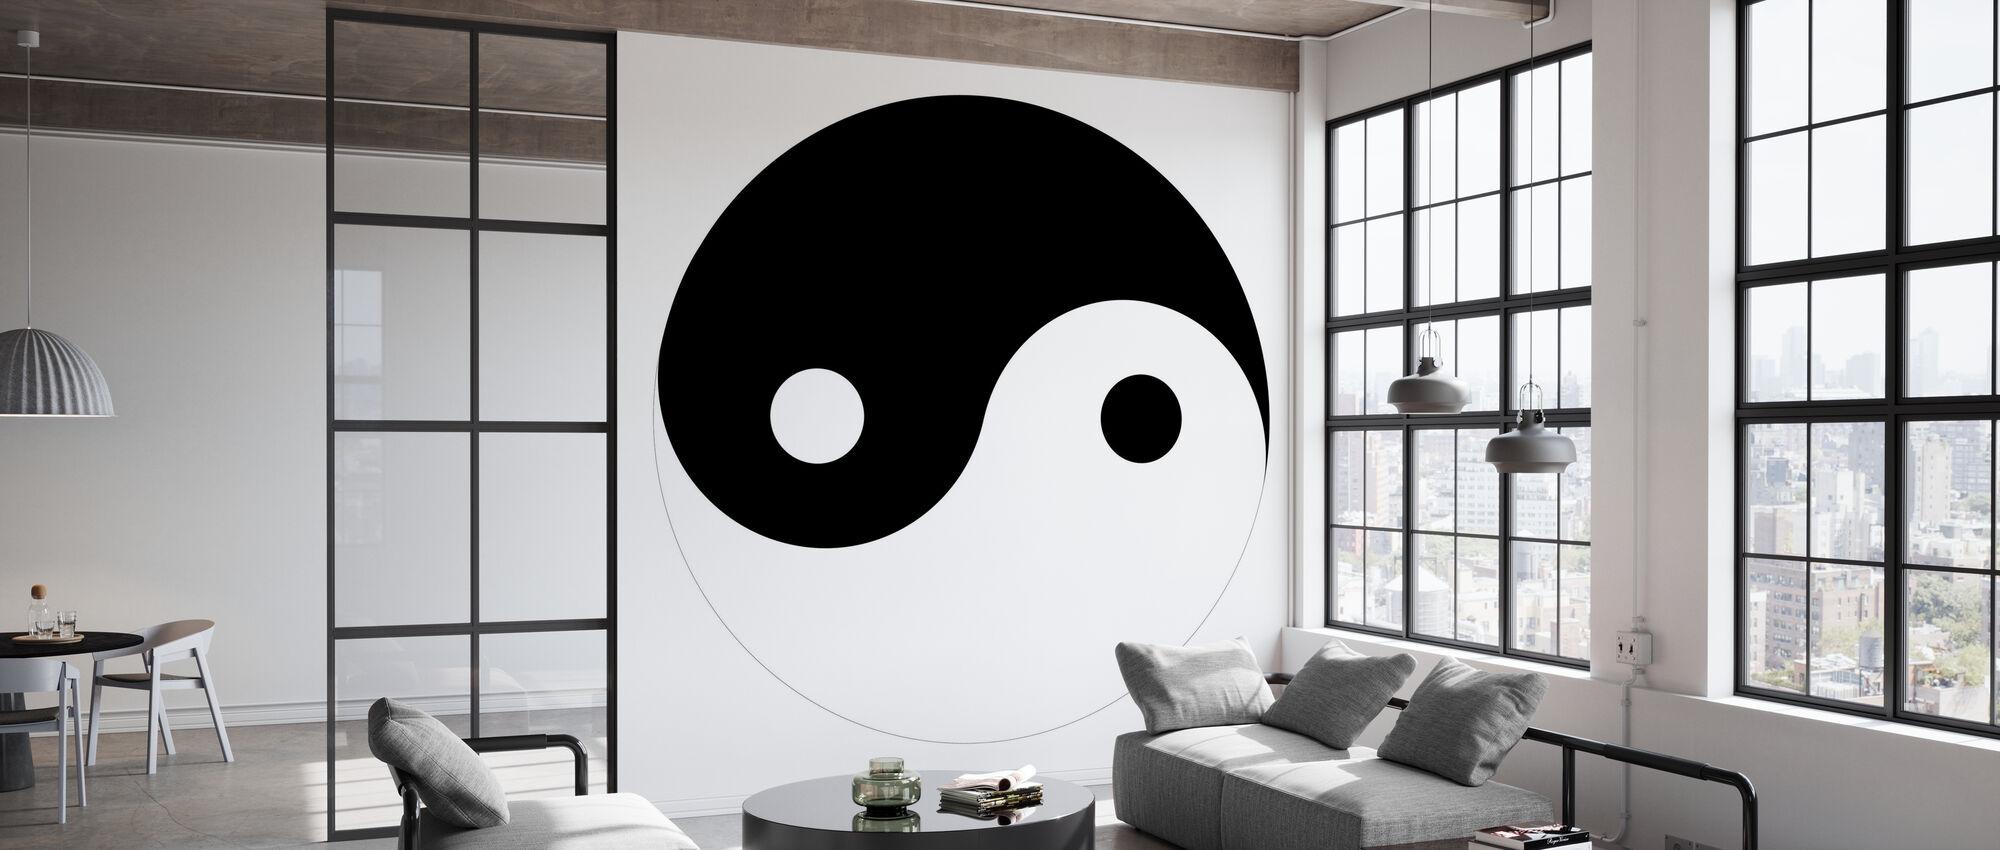 Yin-Yang - Behang - Kantoor